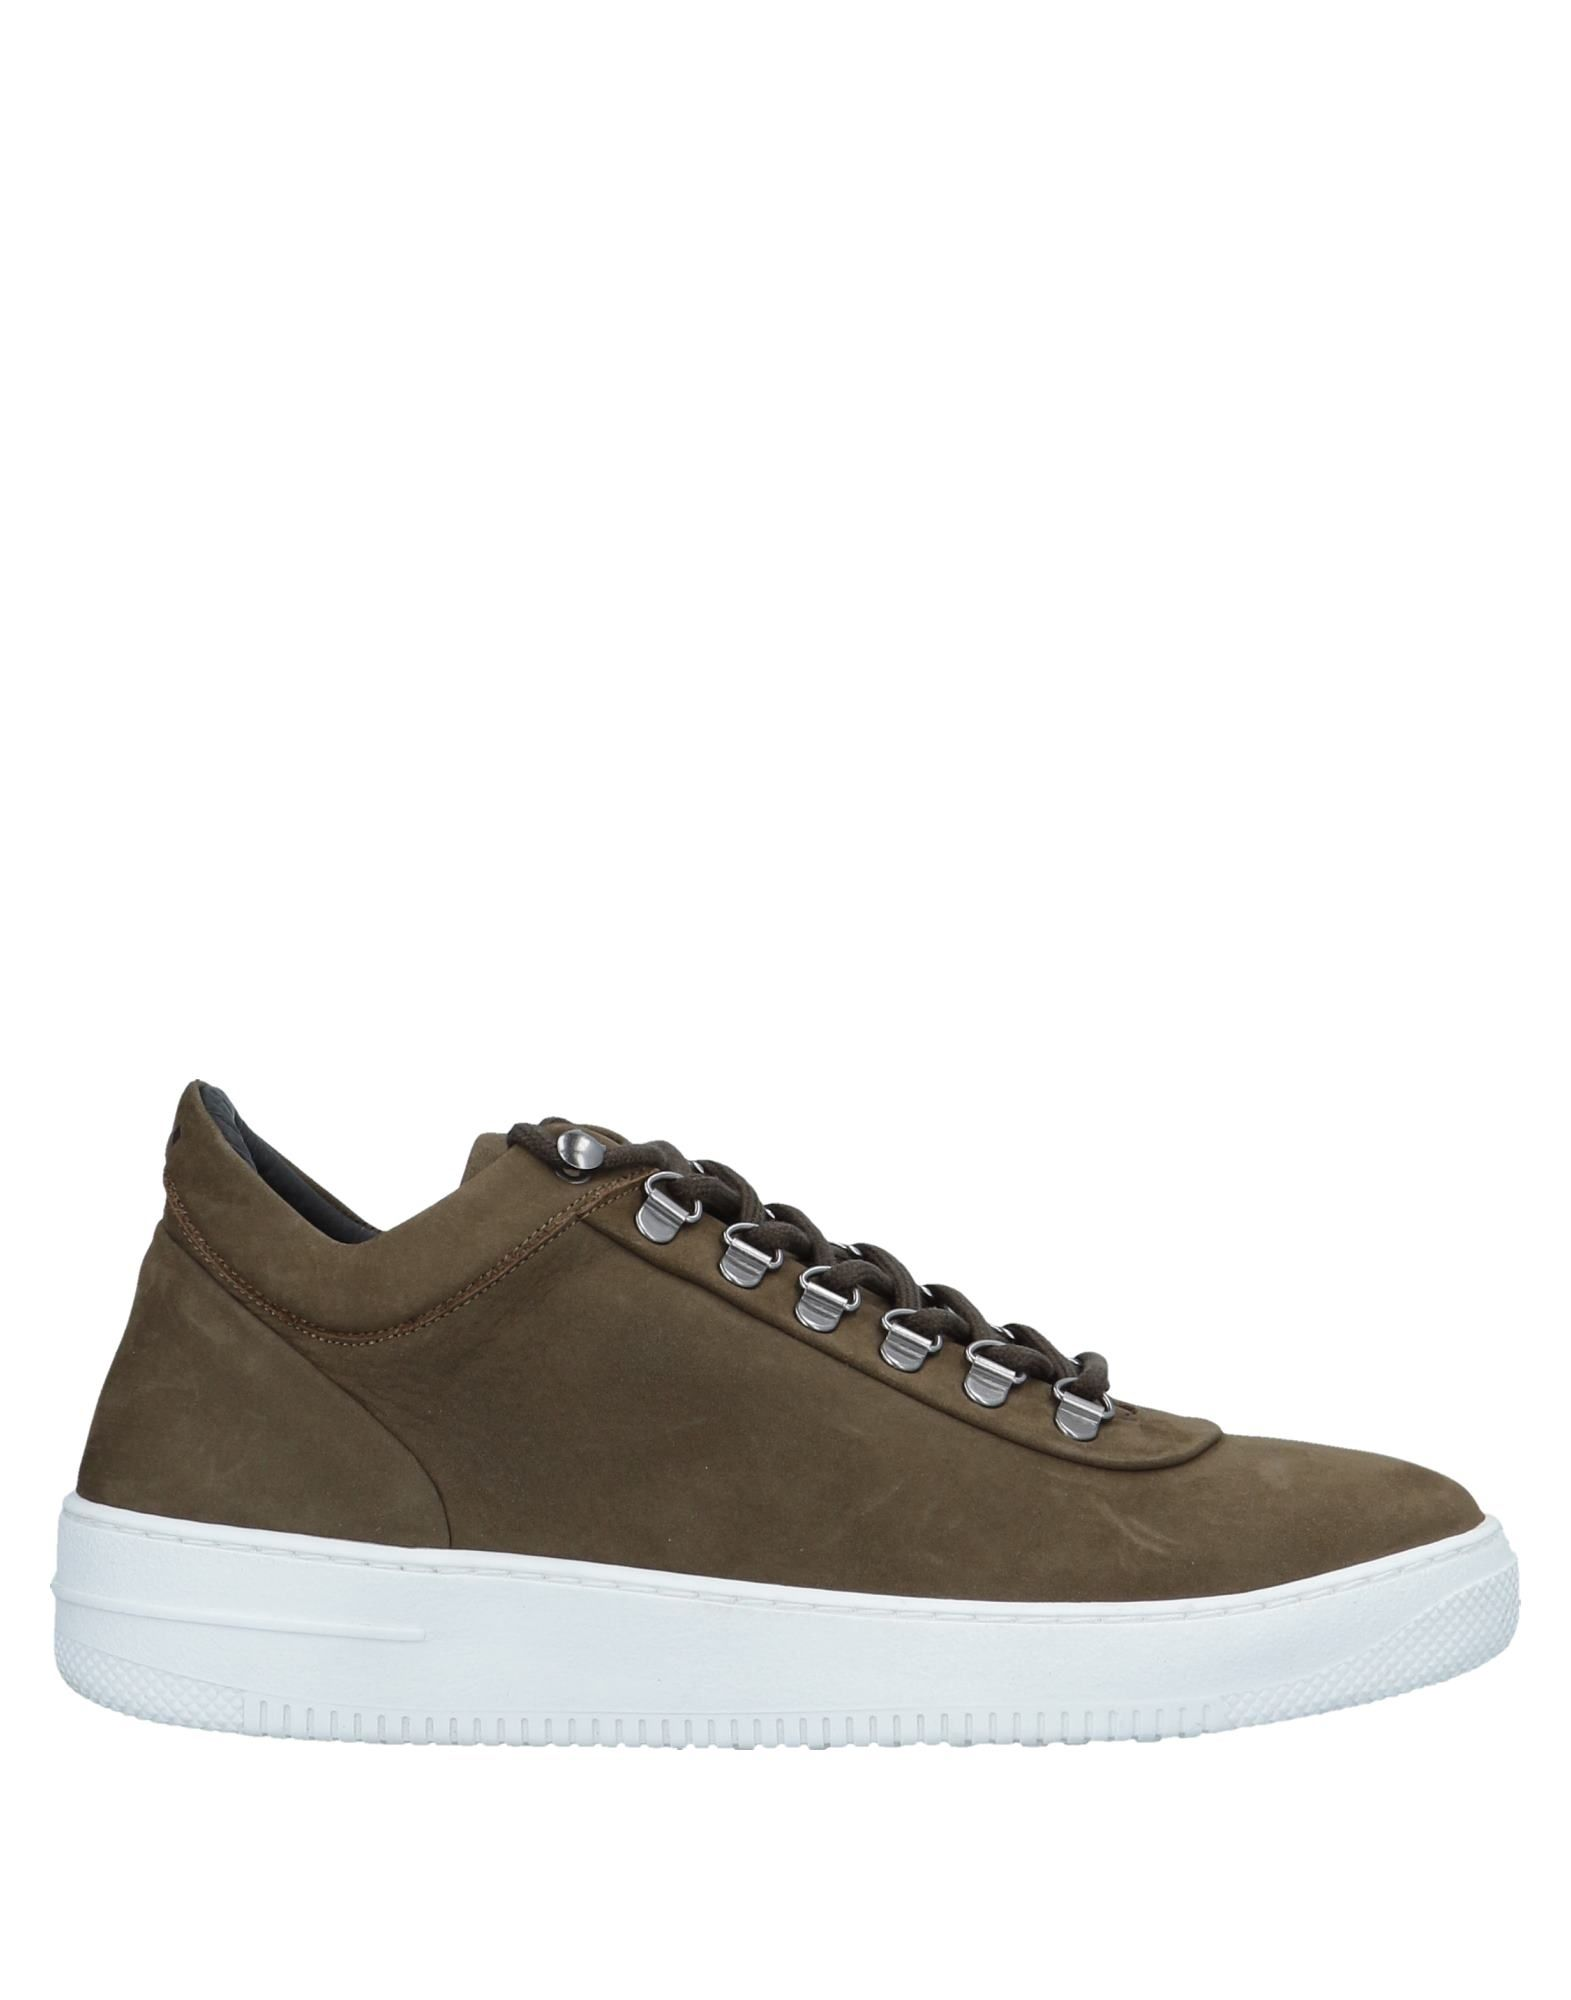 Royal Republiq Republiq Sneakers - Men Royal Republiq Republiq Sneakers online on  Australia - 11543304OH 051df9